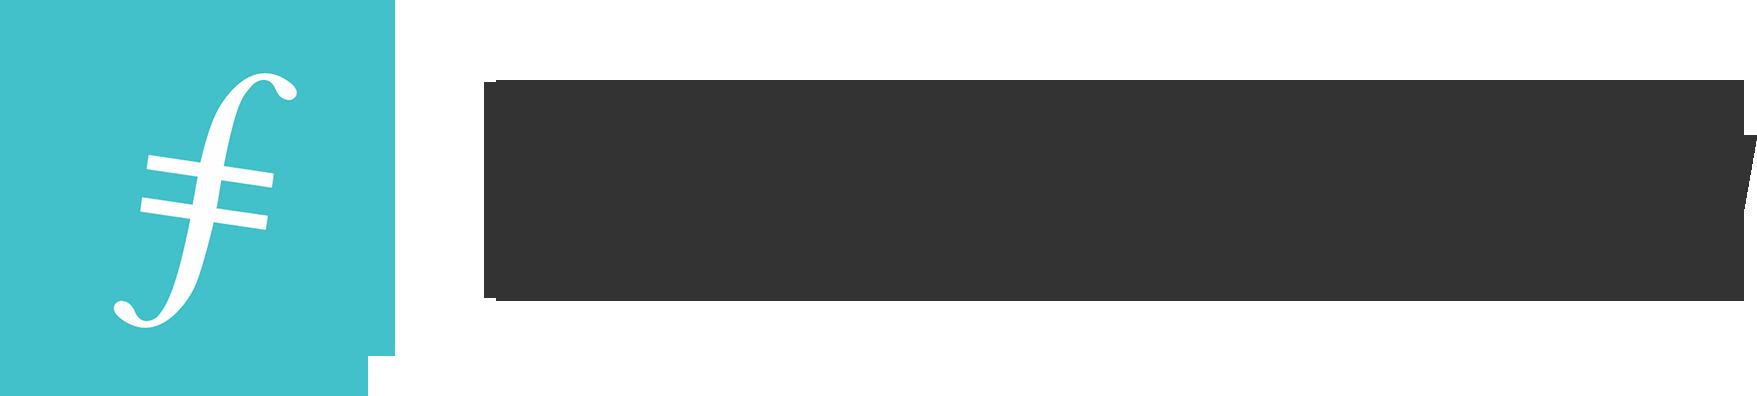 Filecoin Miner